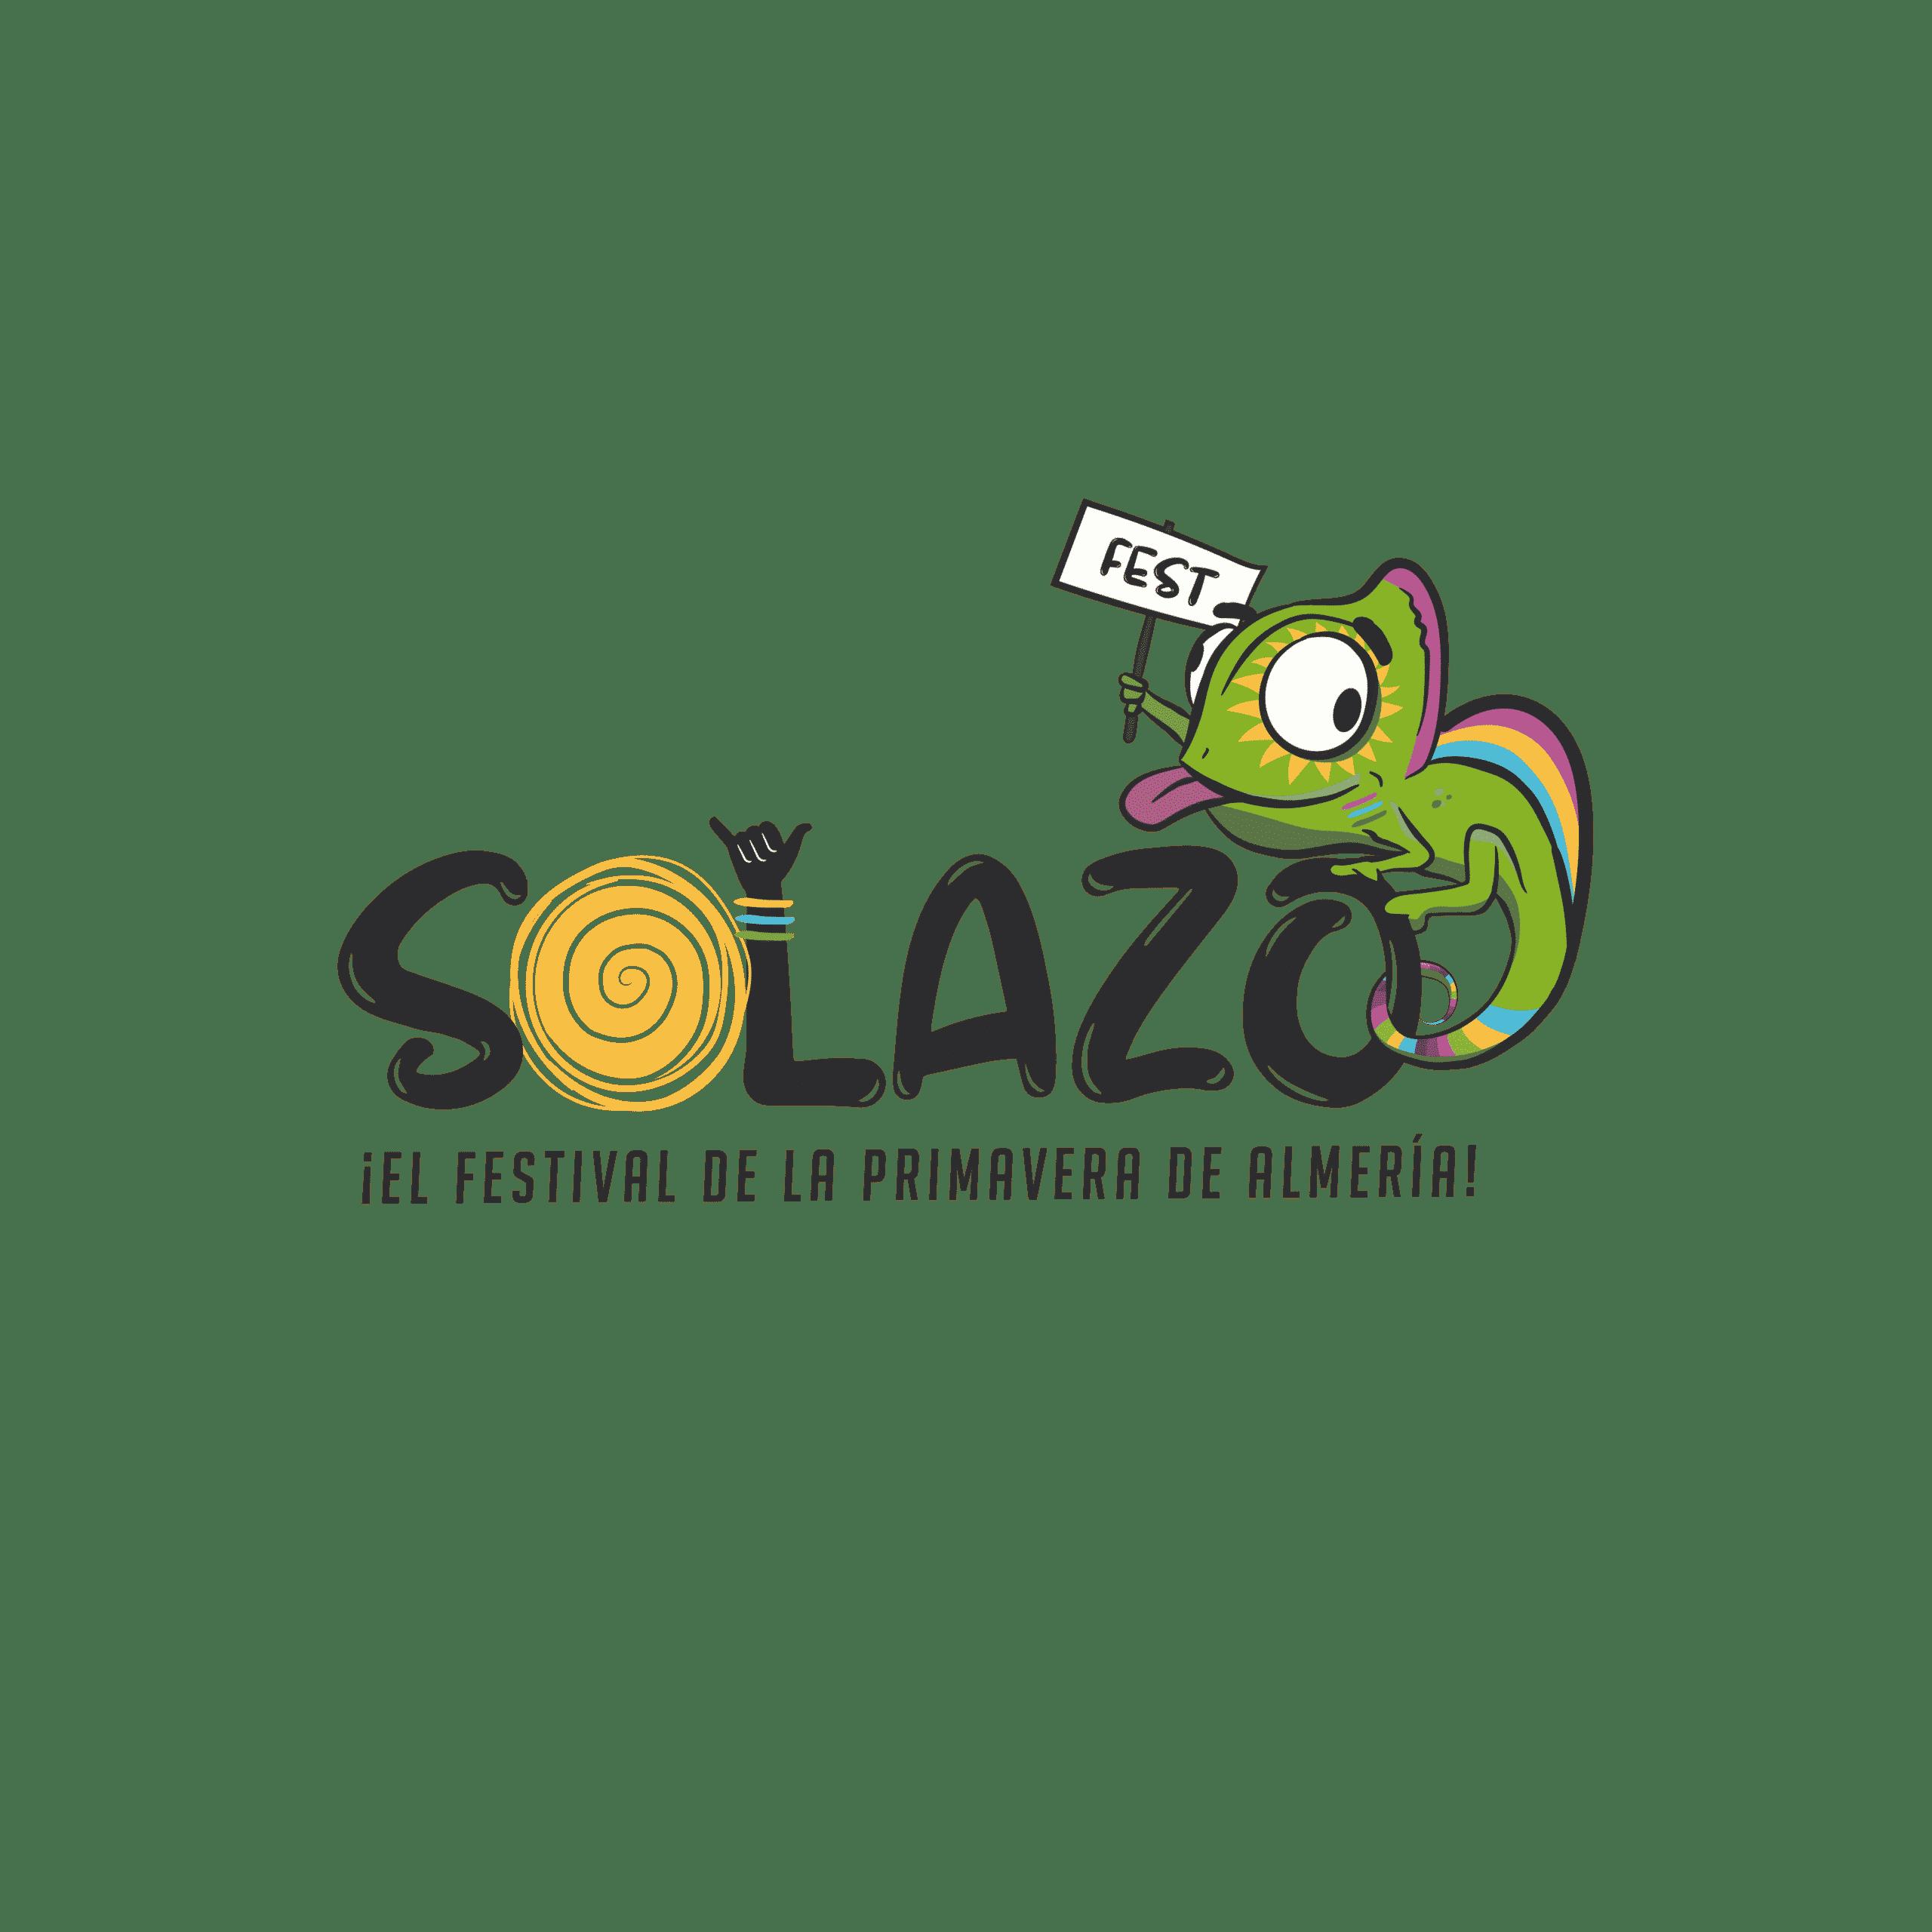 Solazo-FEST-Almería